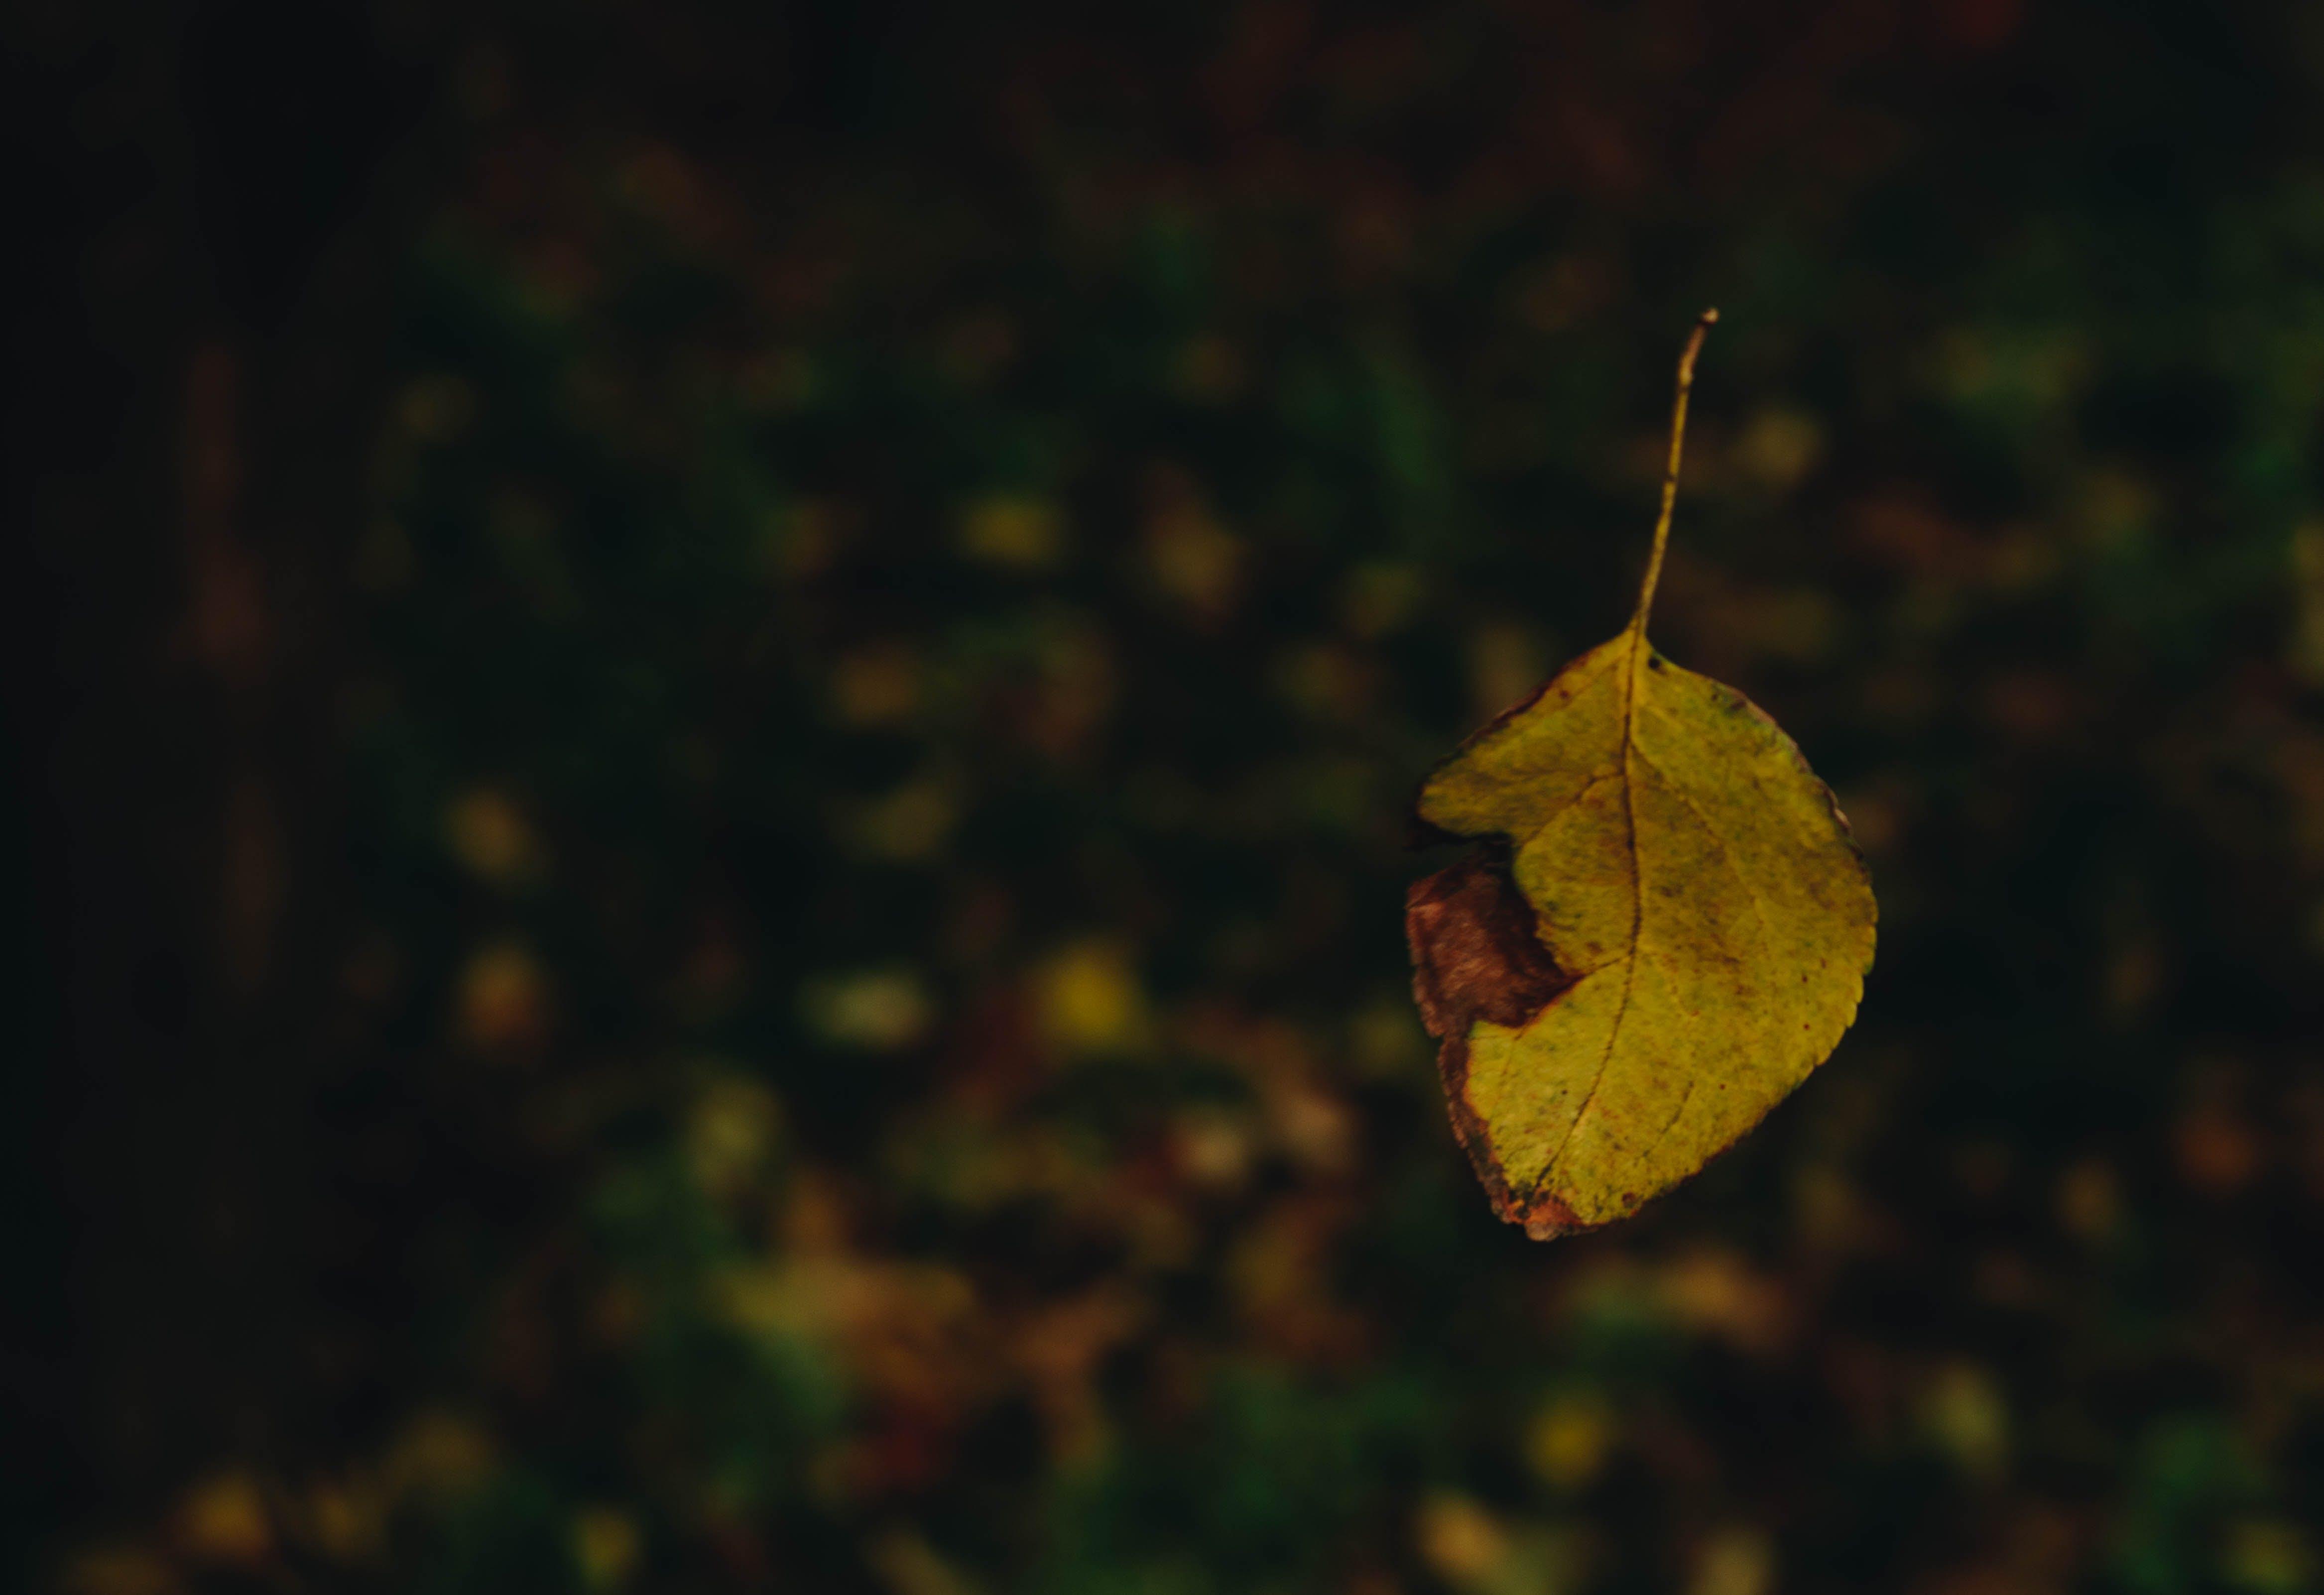 Free stock photo of autumn mood forest, levitate, orange, yellow